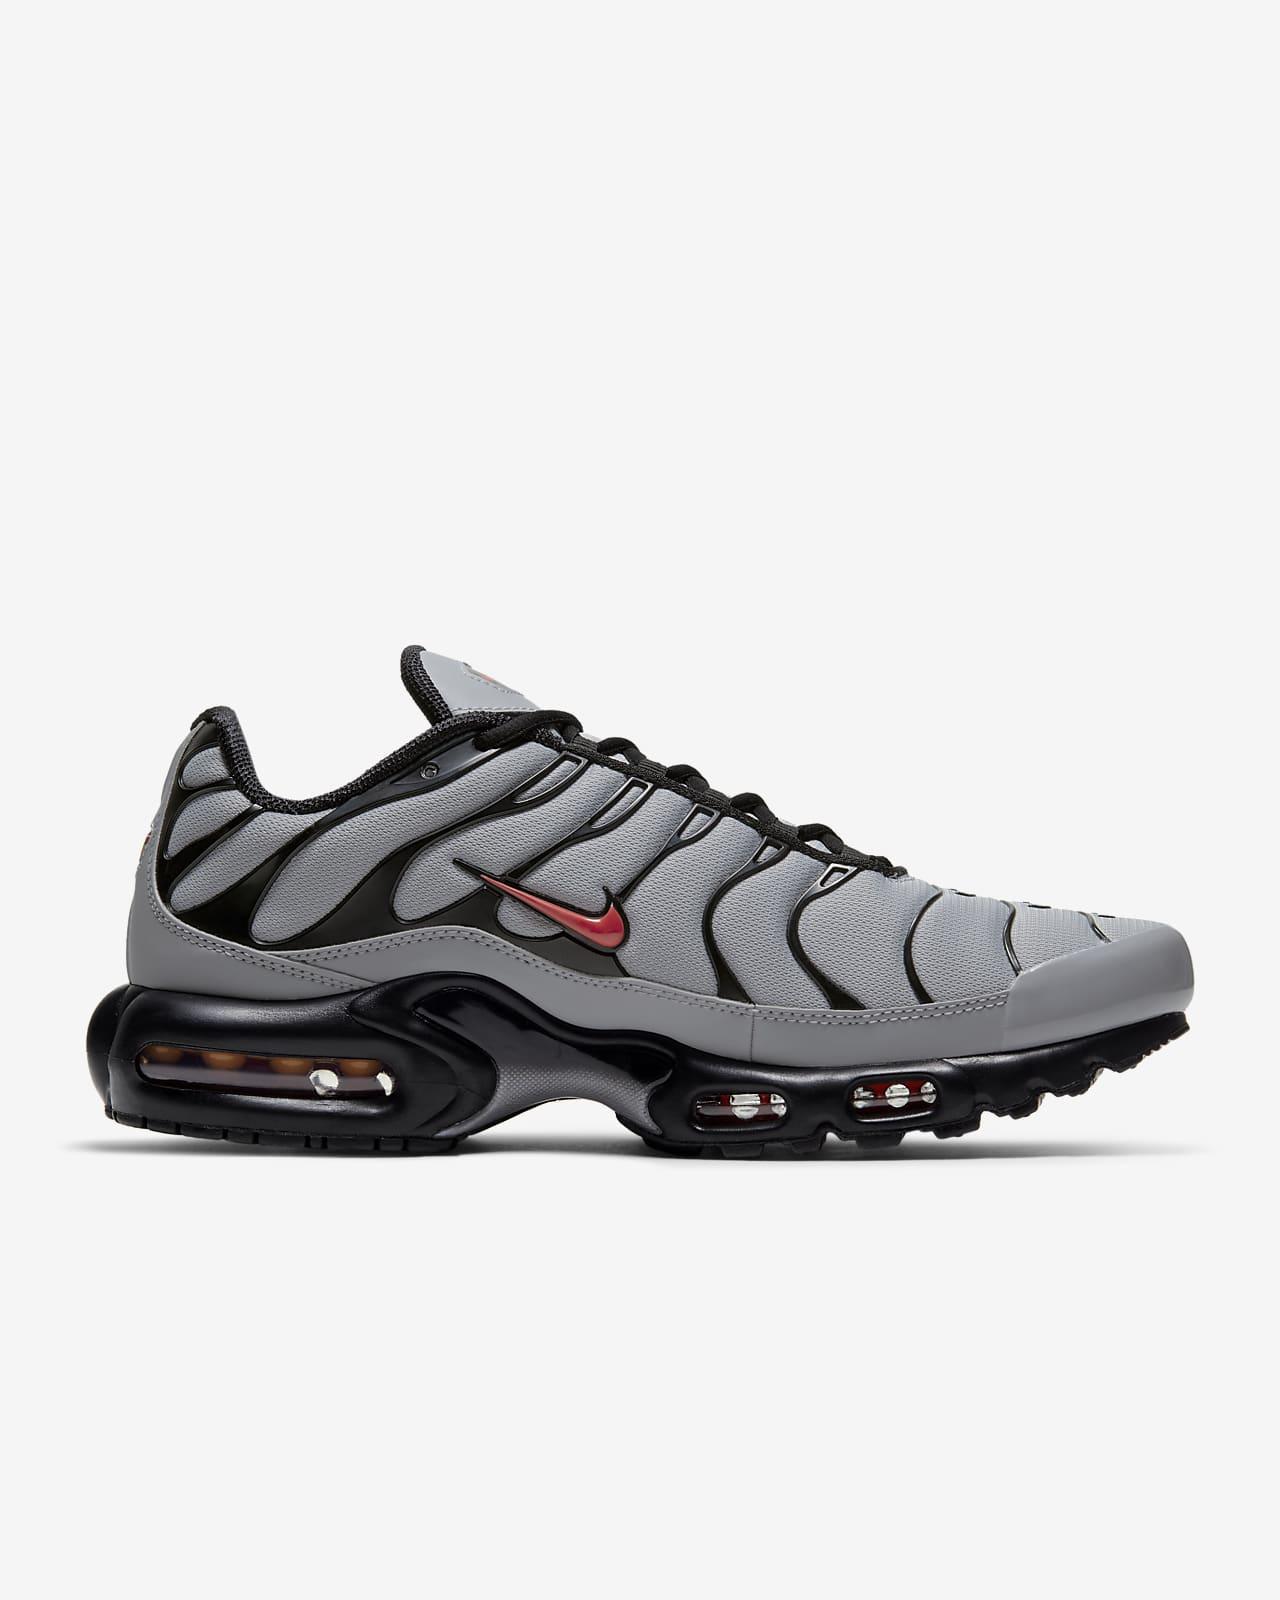 Nike Air Max Plus Men's Shoe. Nike MA